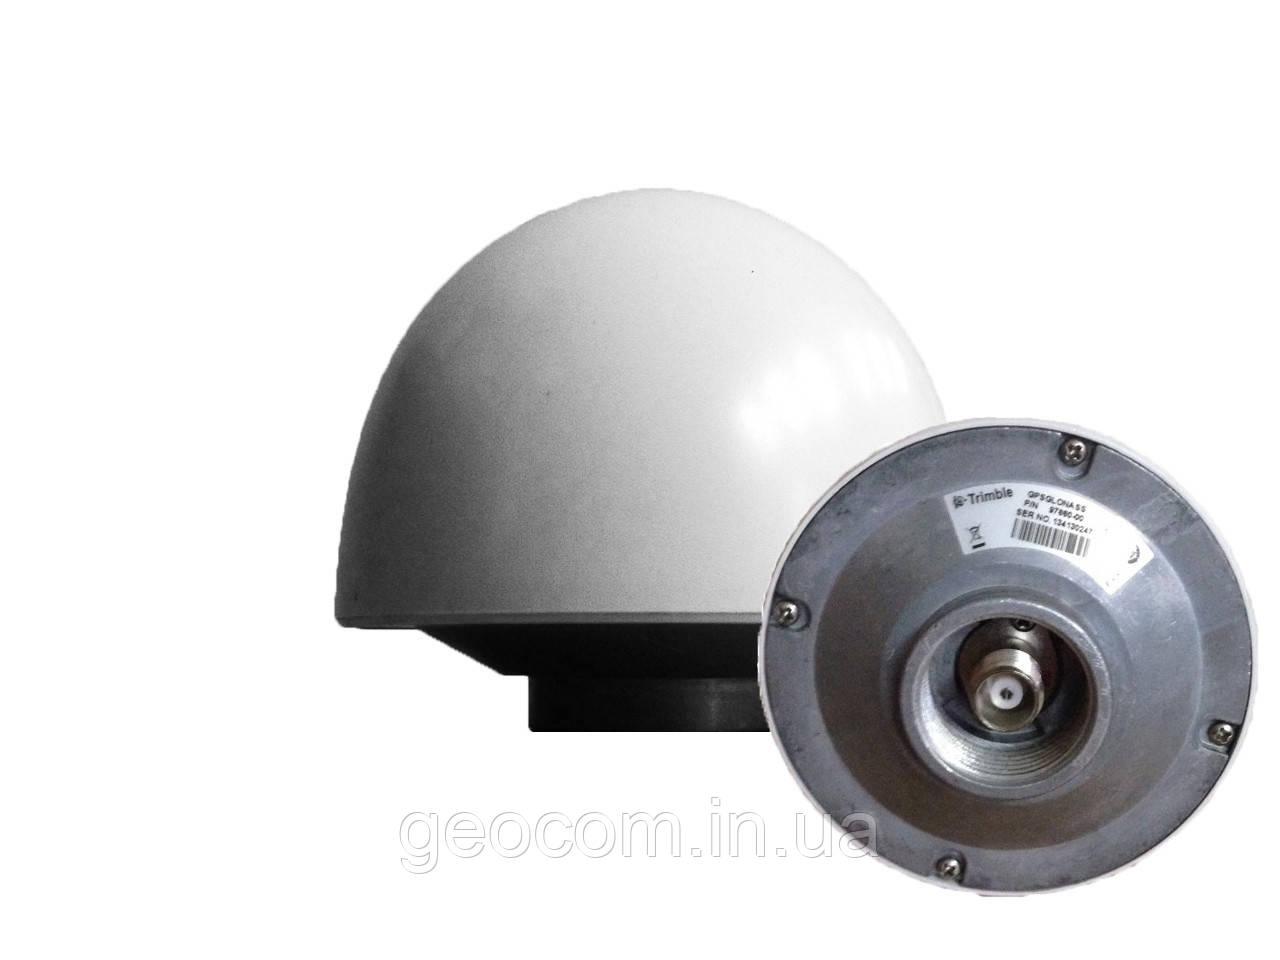 Антенна Trimble BULLET 3 GPS/GLONASS